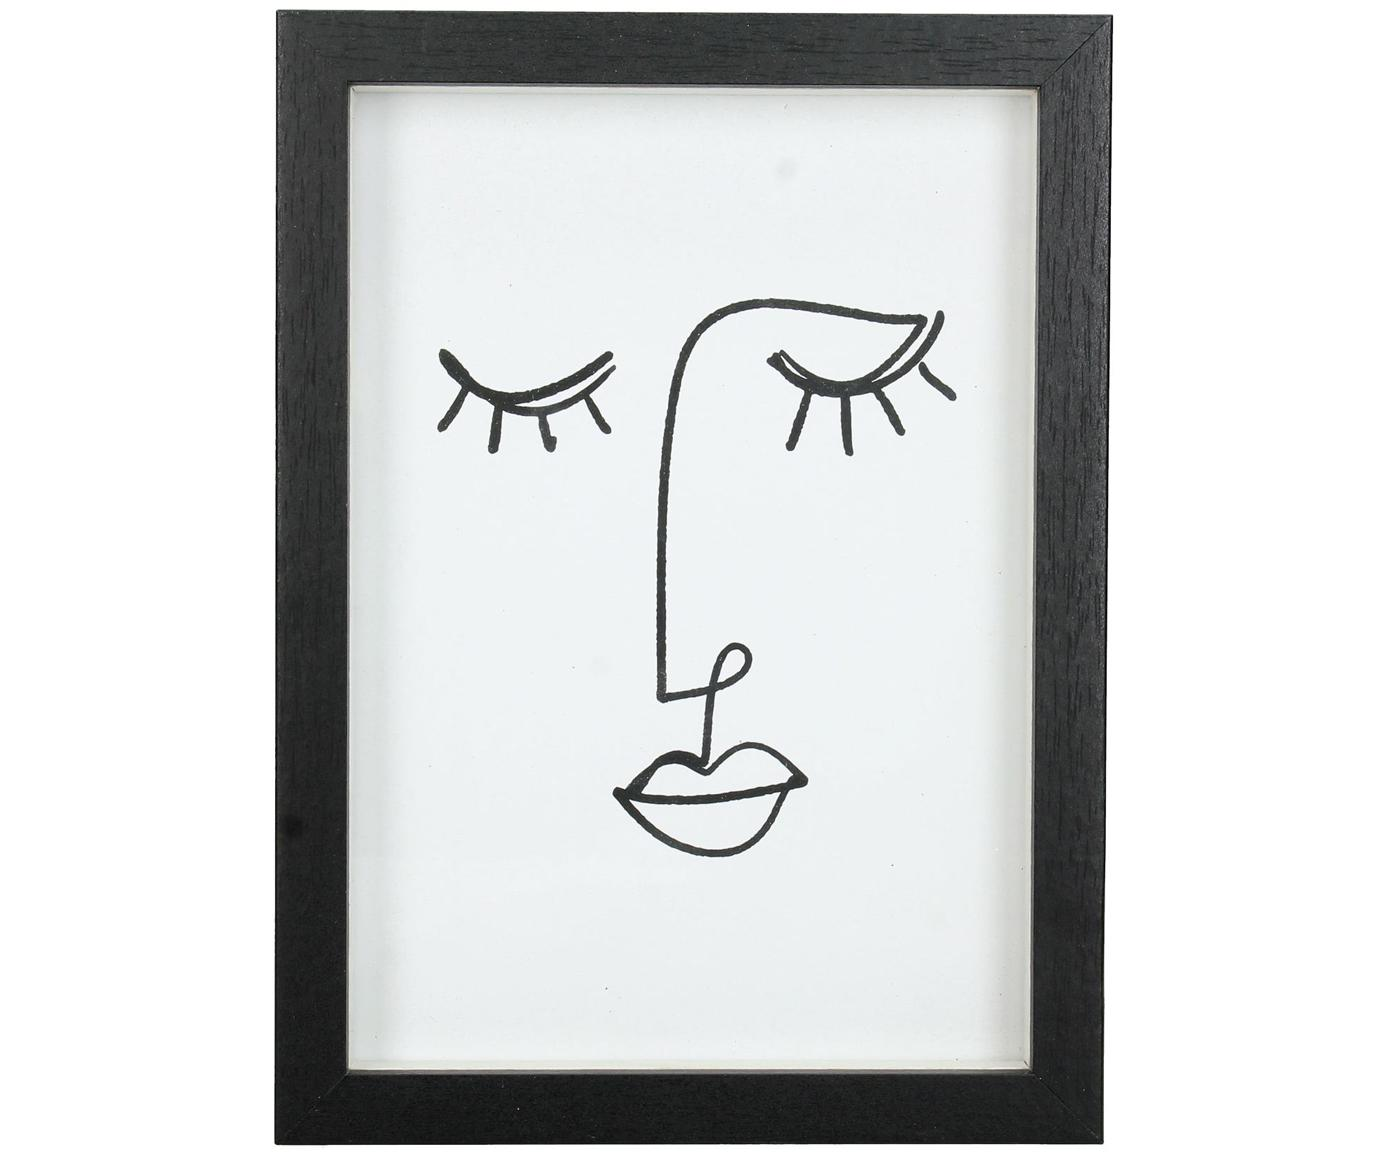 Fotolijstje Claybank, Gecoat hout, Zwart, 13 x 18 cm